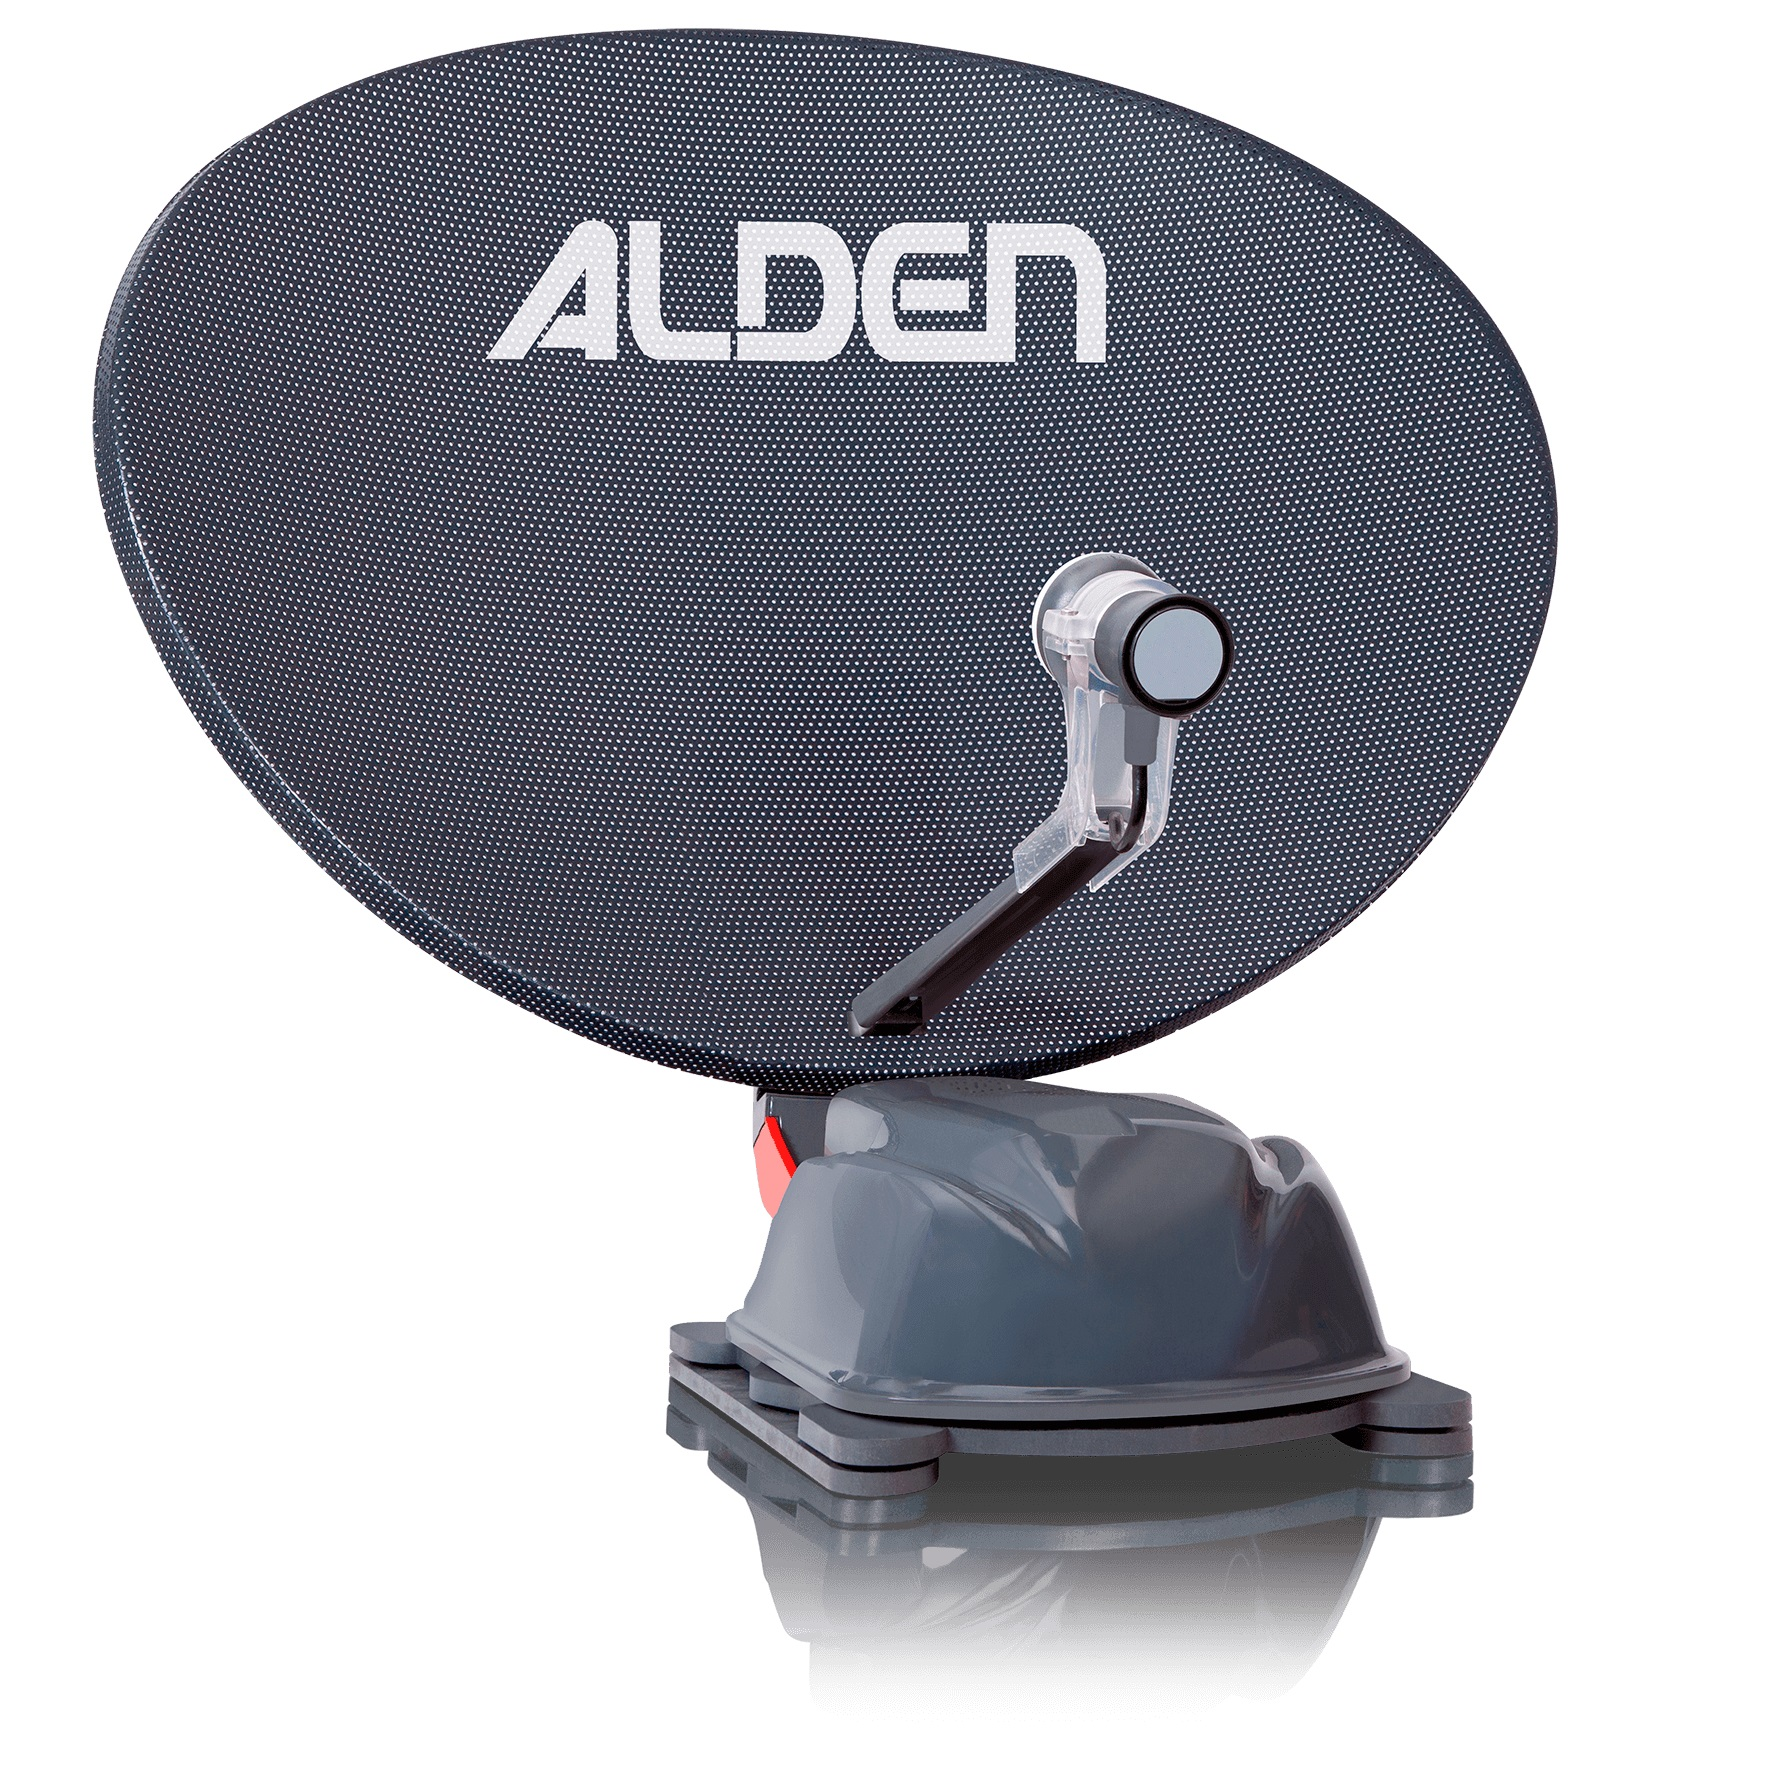 ALDEN AS2 80 HD Platinium